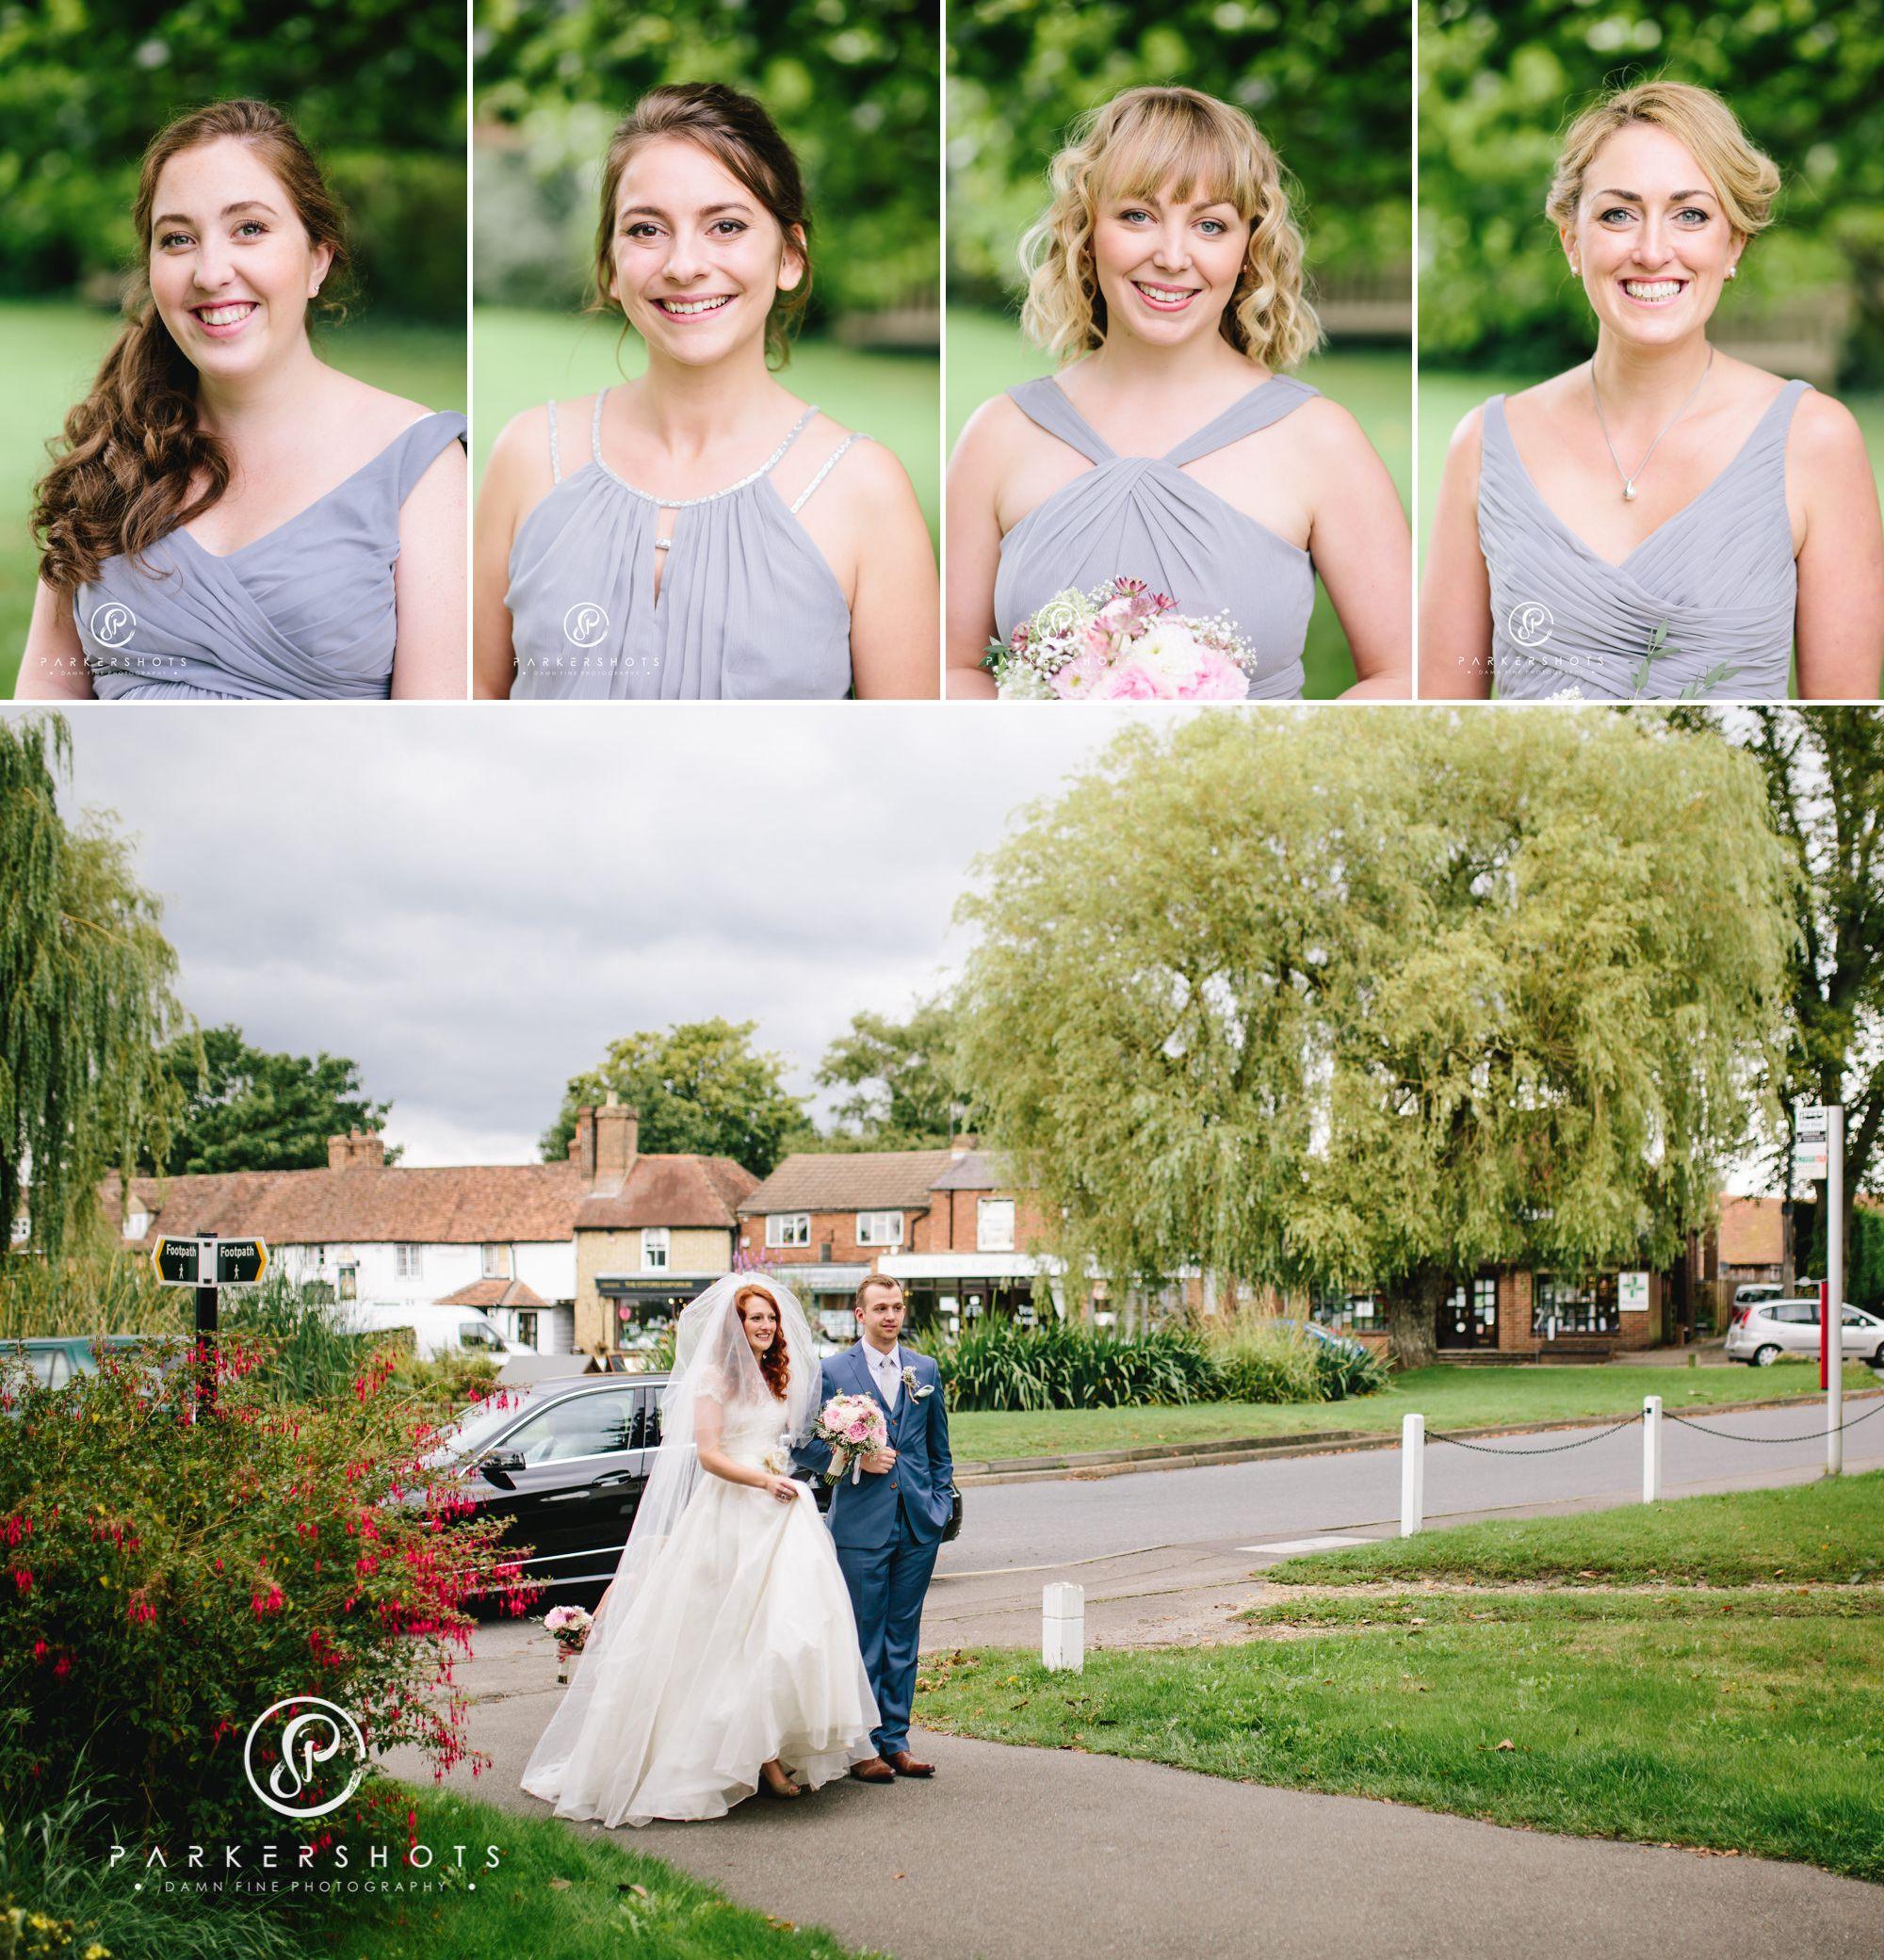 Chiddingstone_Castle_Wedding_Photographer 7